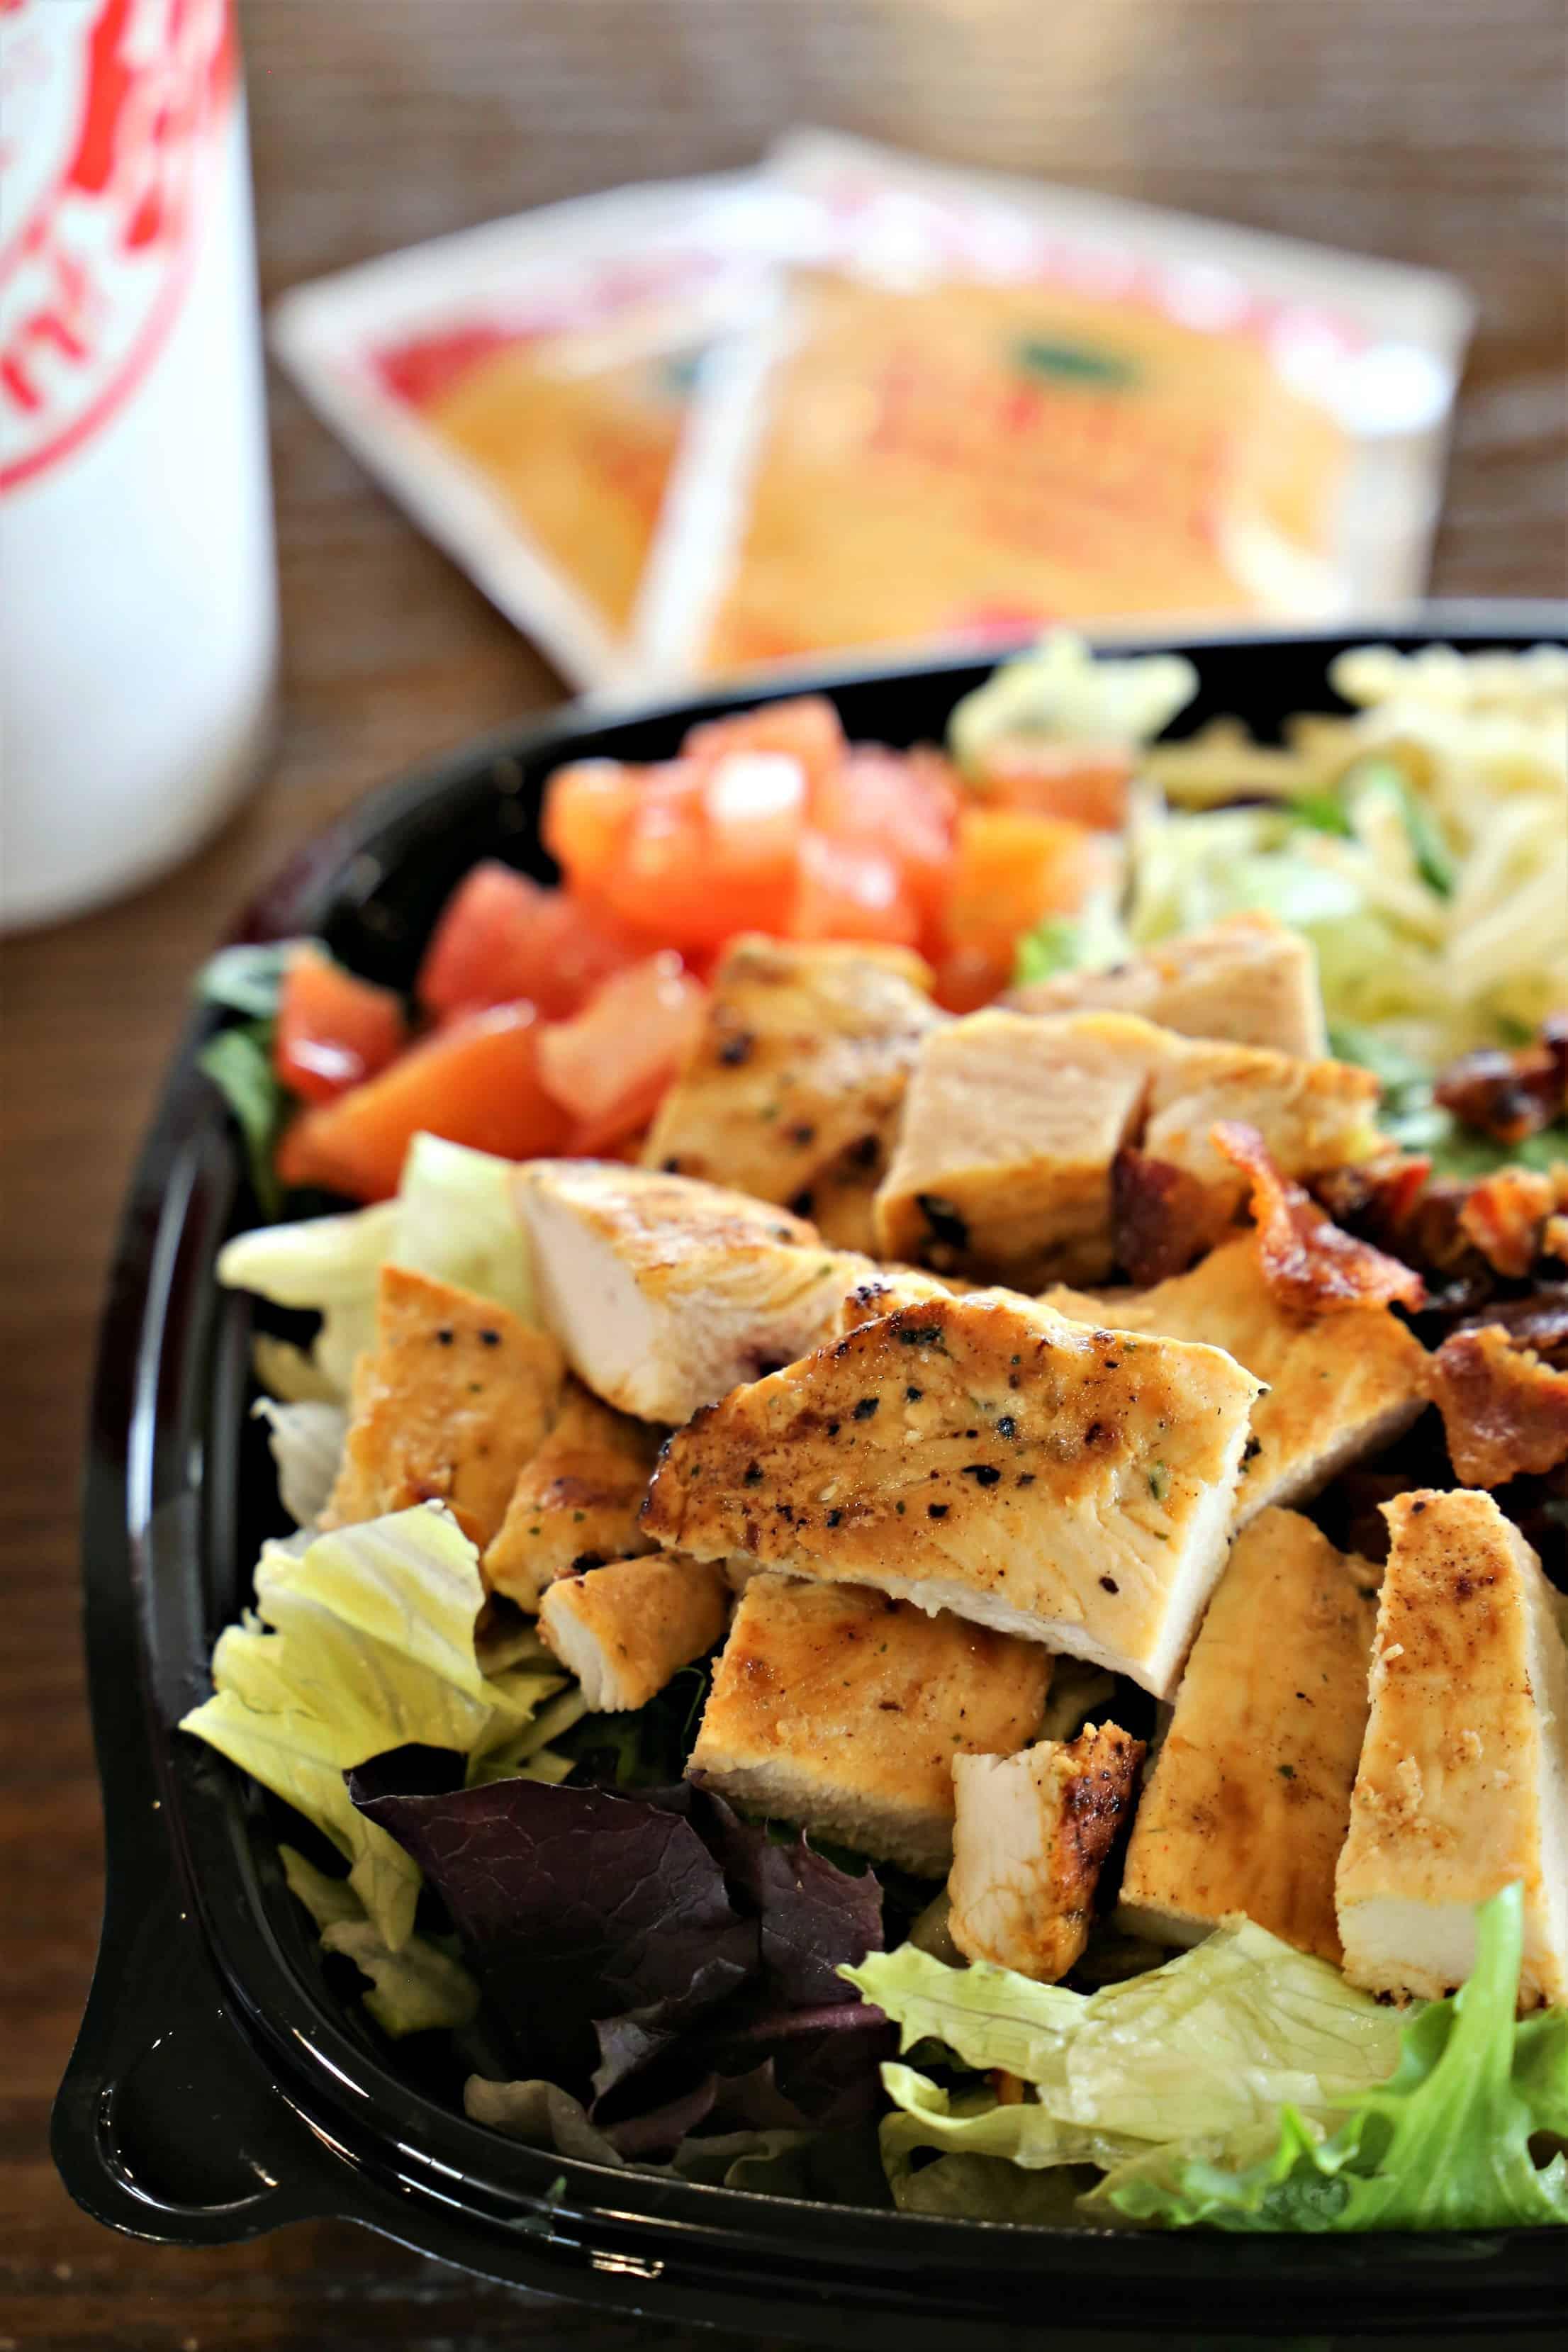 Wendy's Avocado Salad